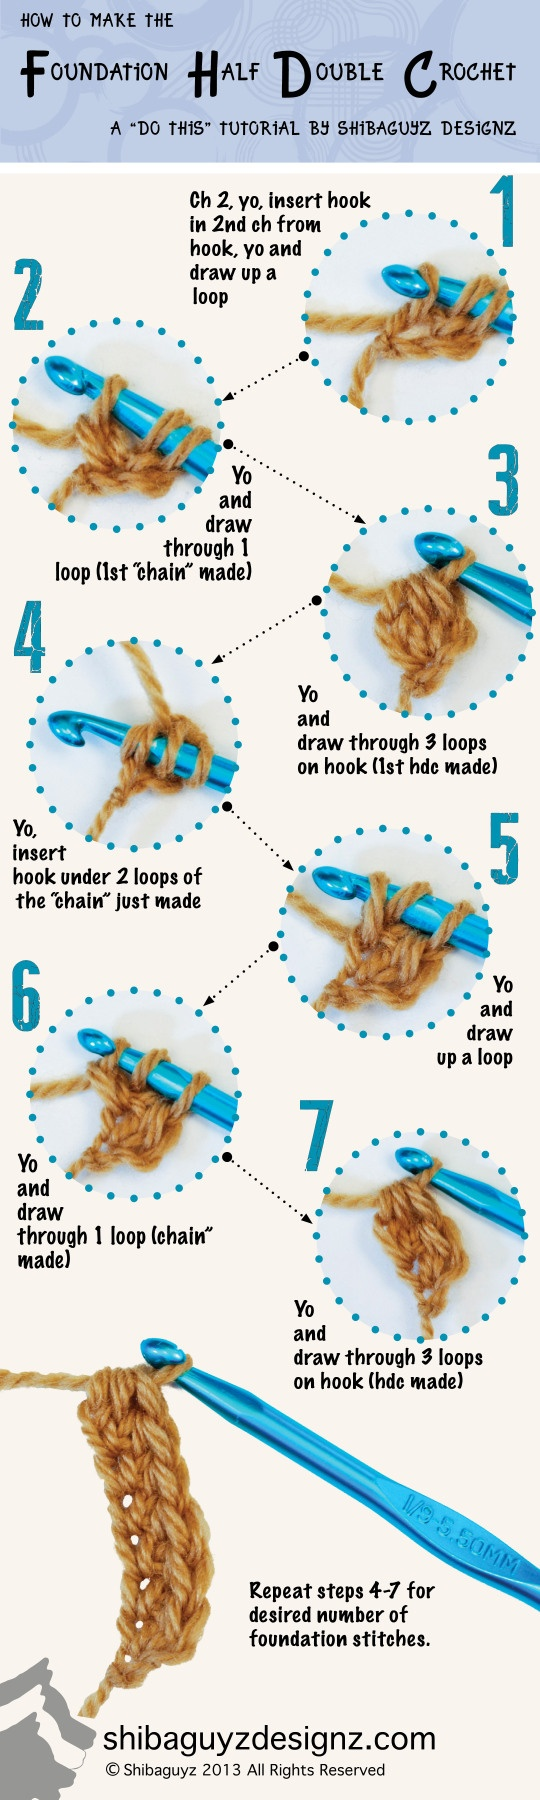 Foundation Half Double Crochet Infographic Knits Pinterest Diagram